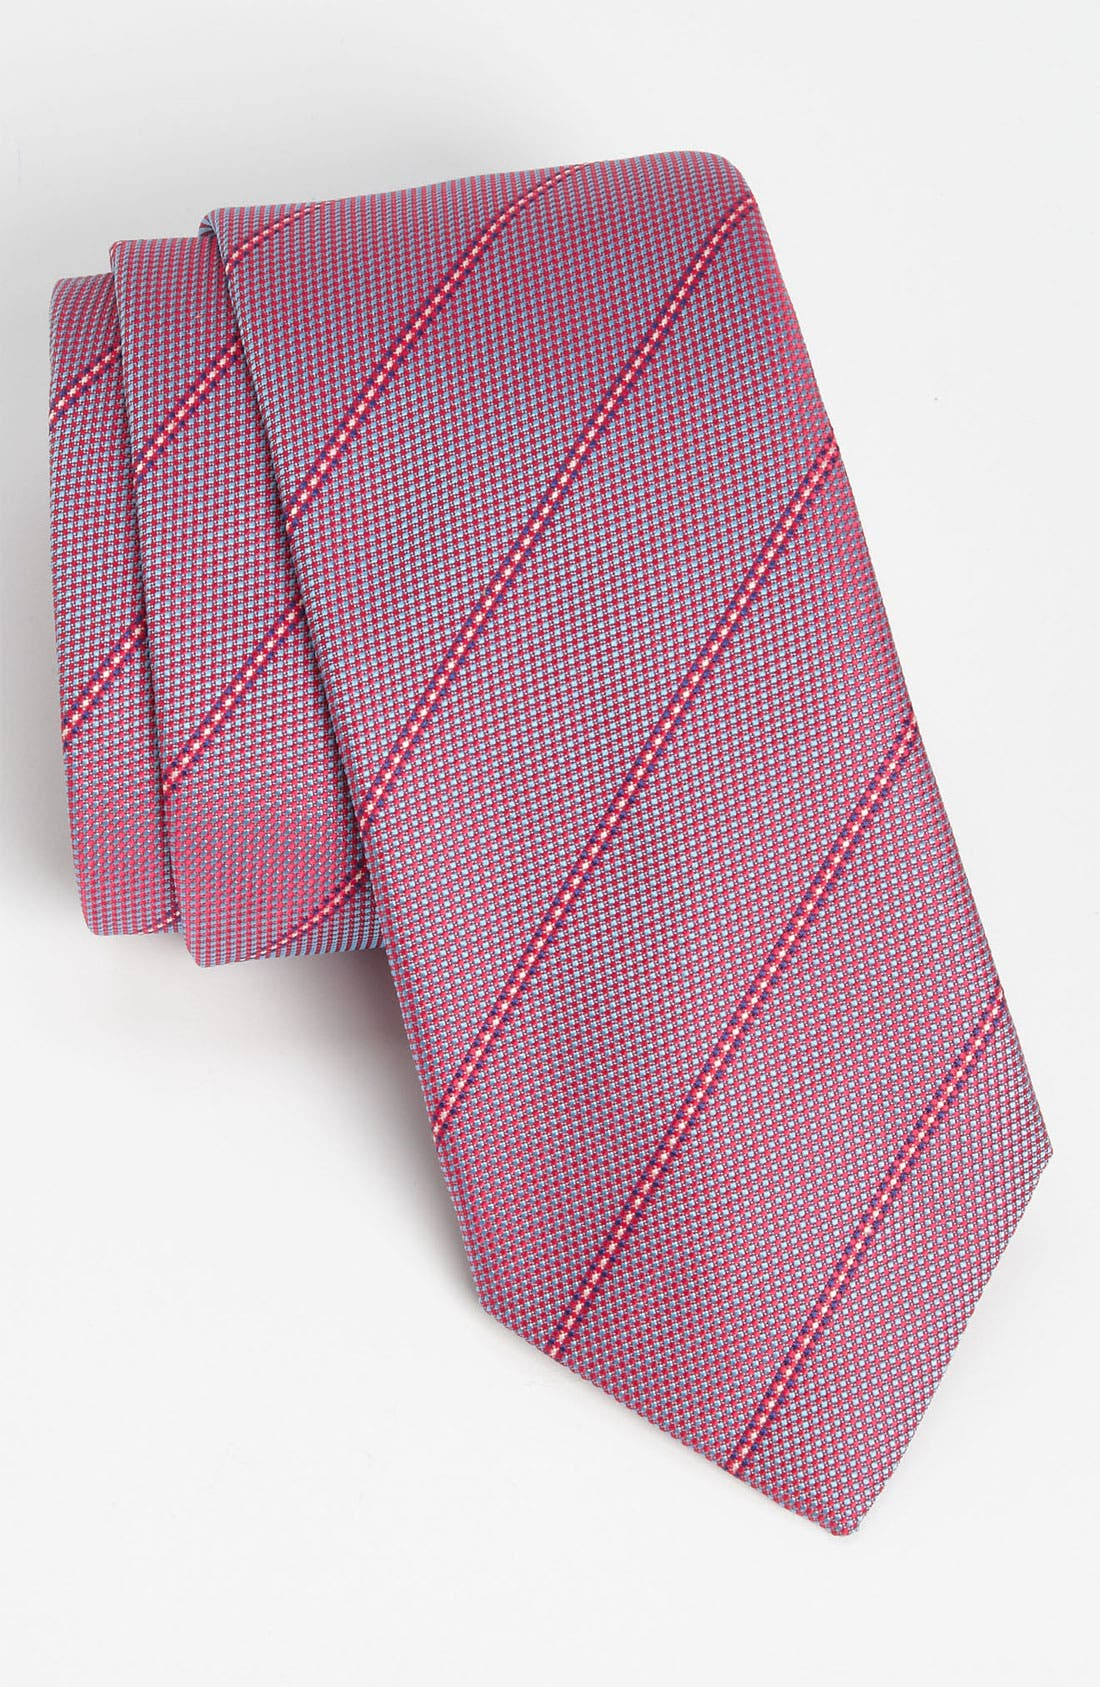 Alternate Image 1 Selected - Thomas Pink 'Turner Stripe' Woven Silk Tie